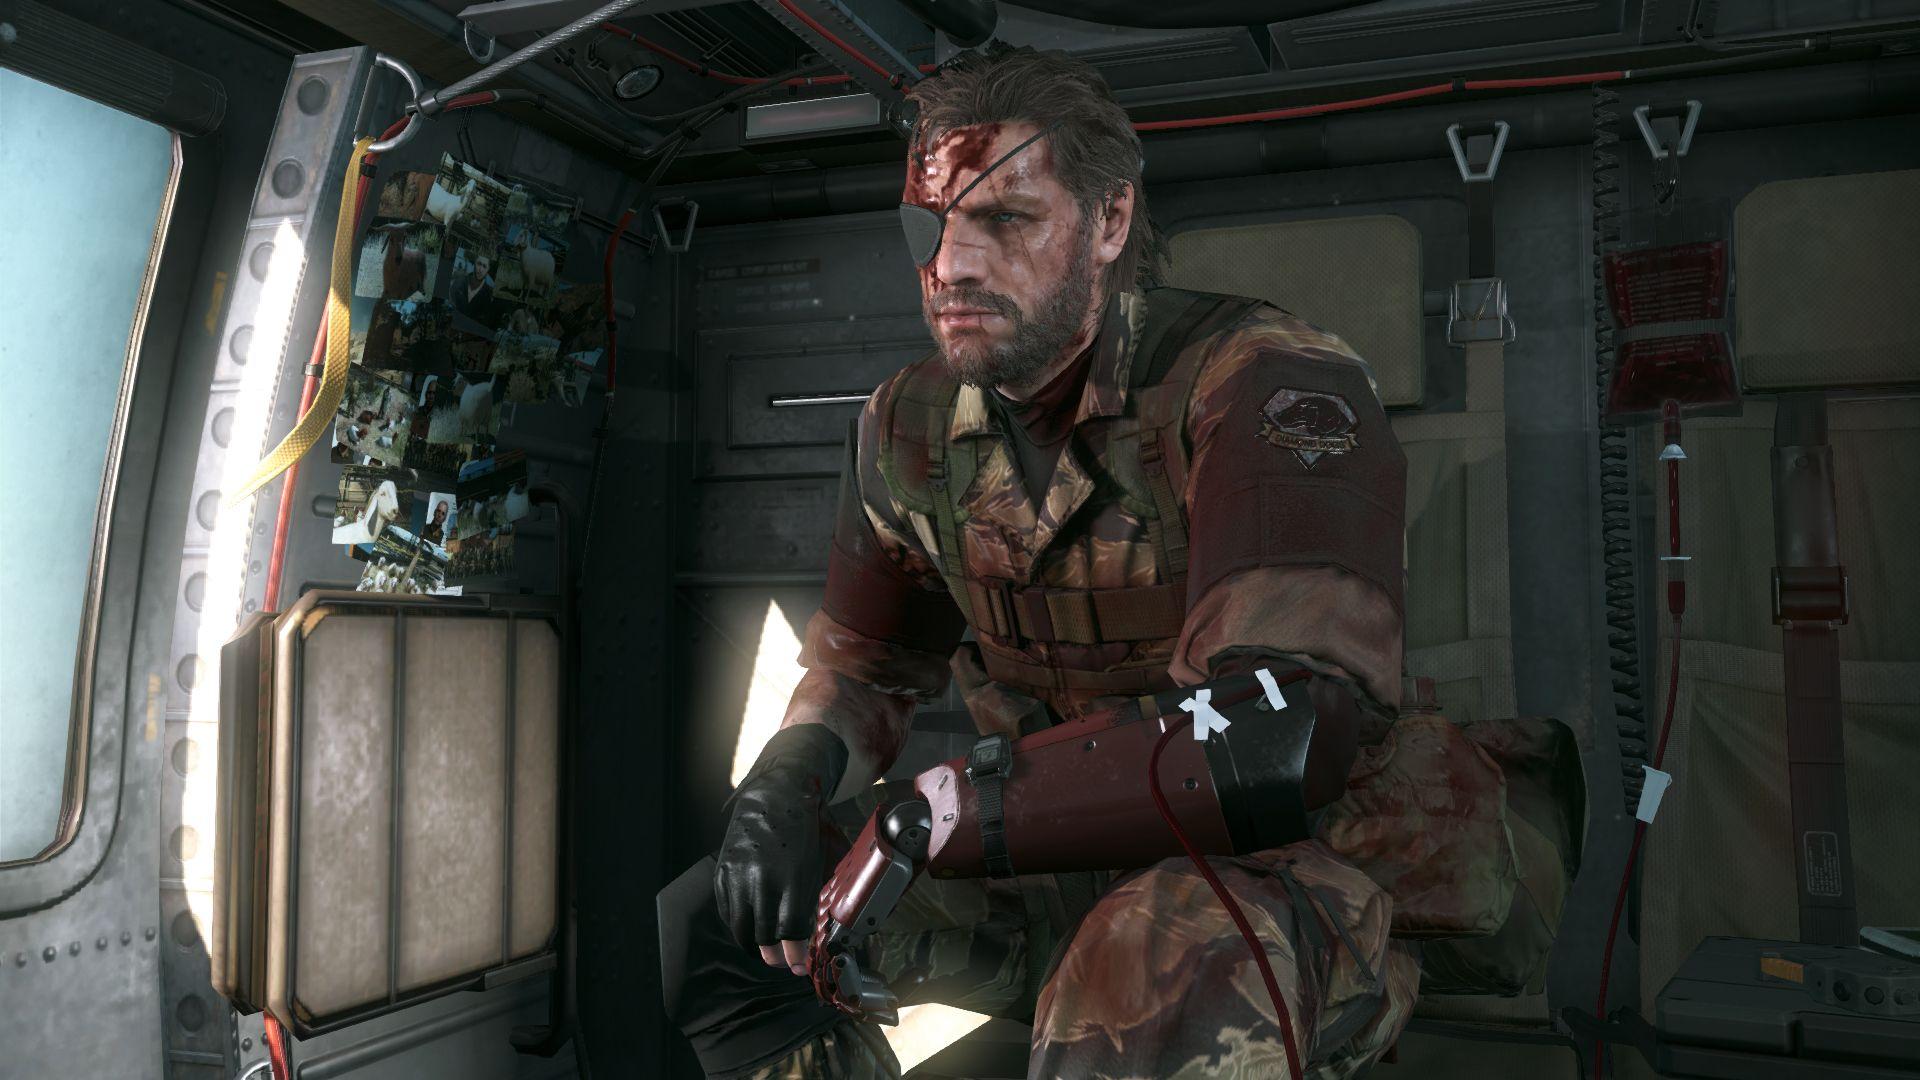 Spousta nových HD obrázků z Metal Gear Solid V: The Phantom Pain 110537